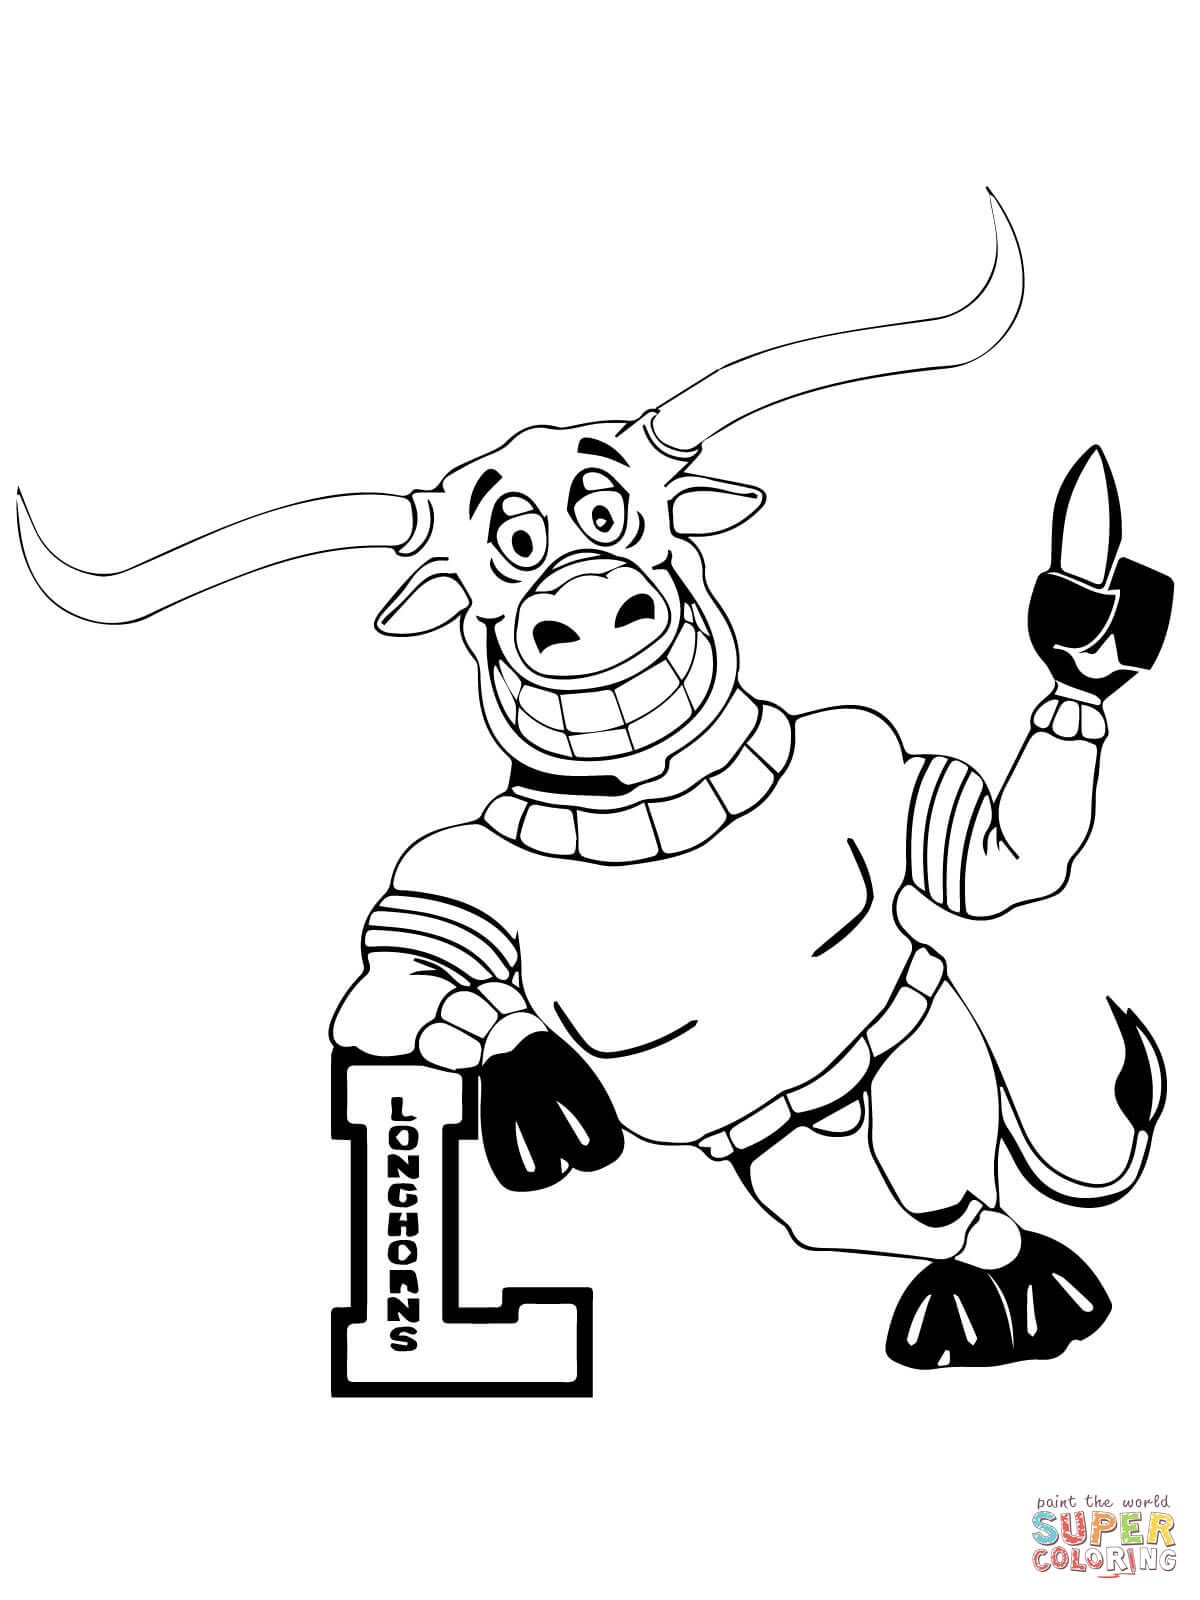 Raiders Logo Drawing at GetDrawings | Free download